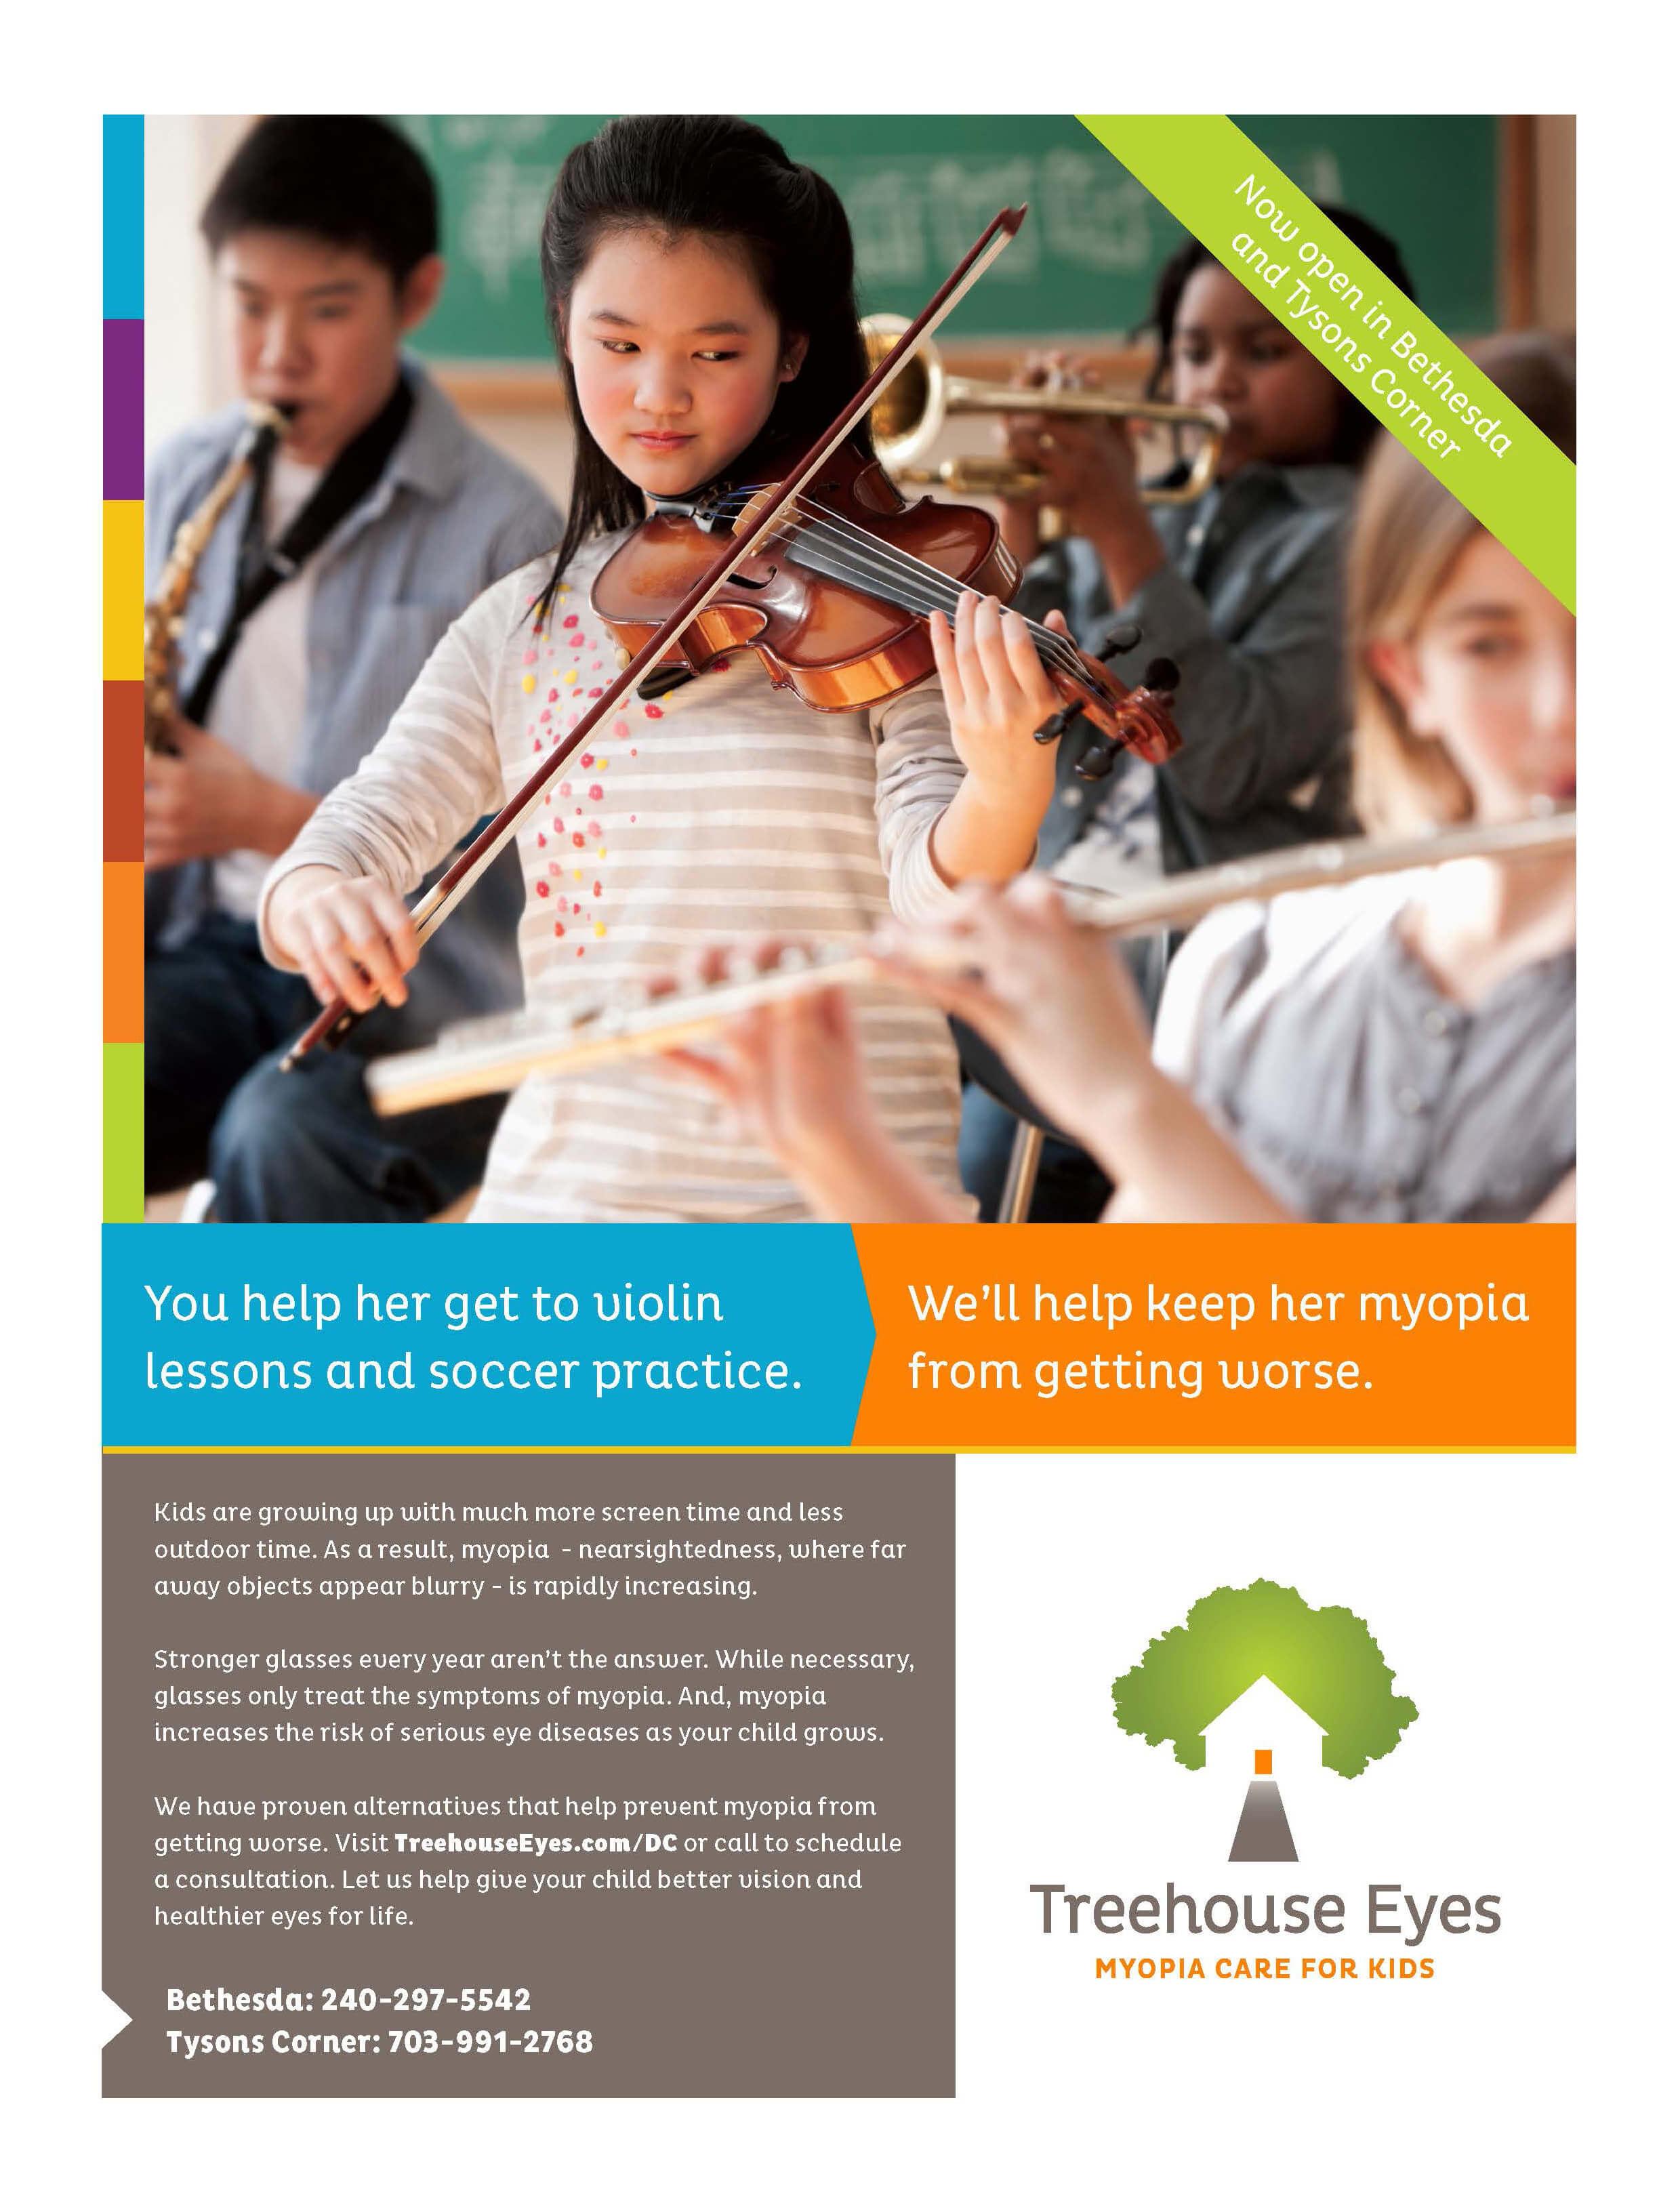 november_treehouseeyes_v_washparent_violin